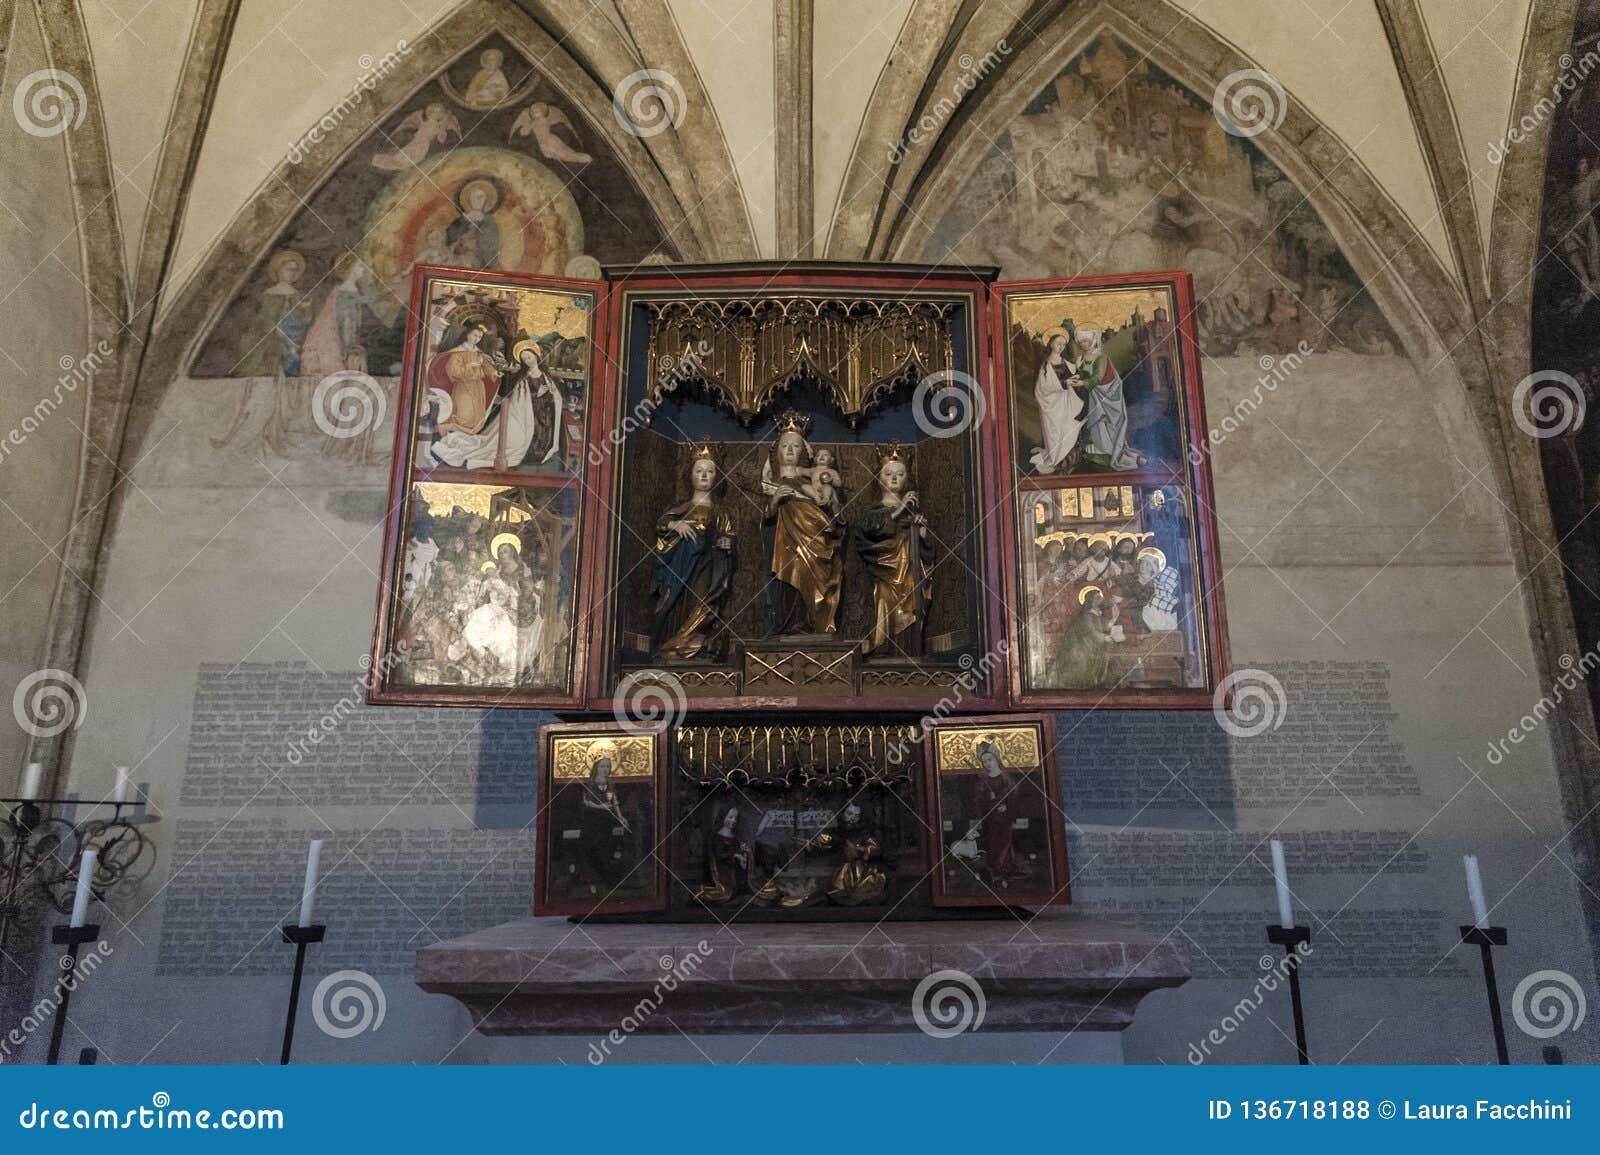 Último altar de madera gótico espléndido a partir del siglo XV en la capilla de St Magdalena, St Magdalena Kapelle, Hall In Tirol